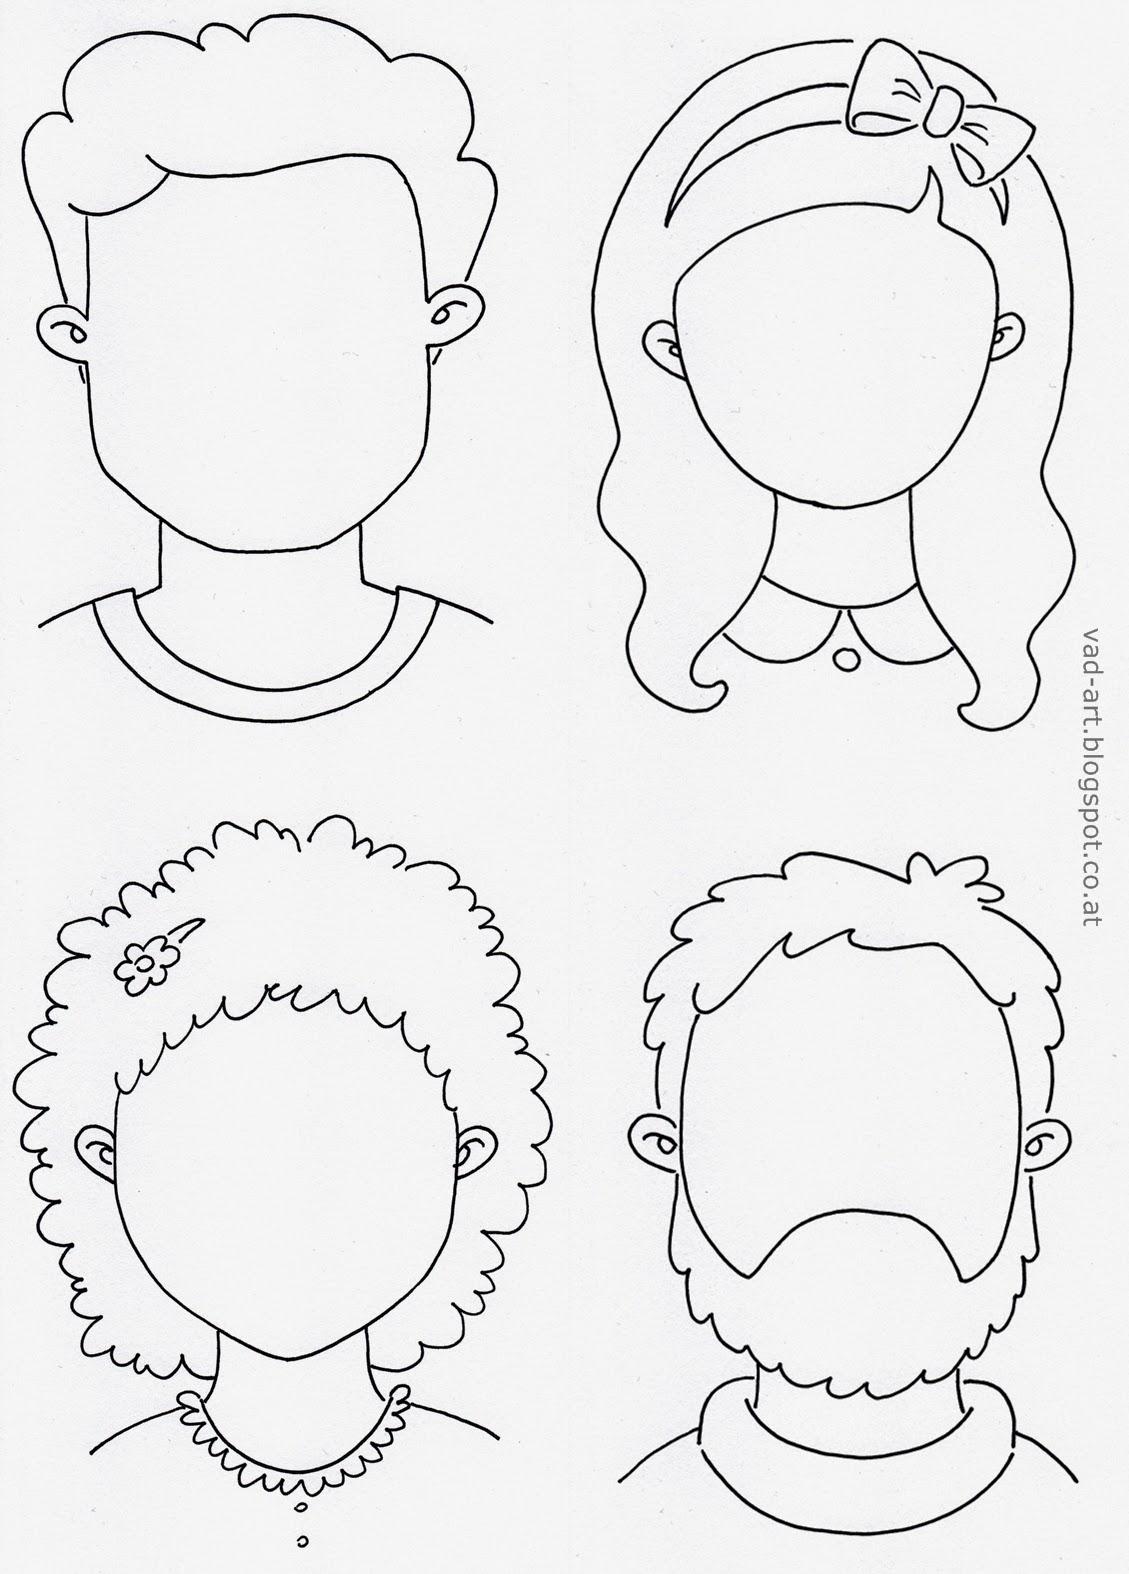 Sonja Häusl-Vad Illustrations: Malujeme s dětmi + šablona